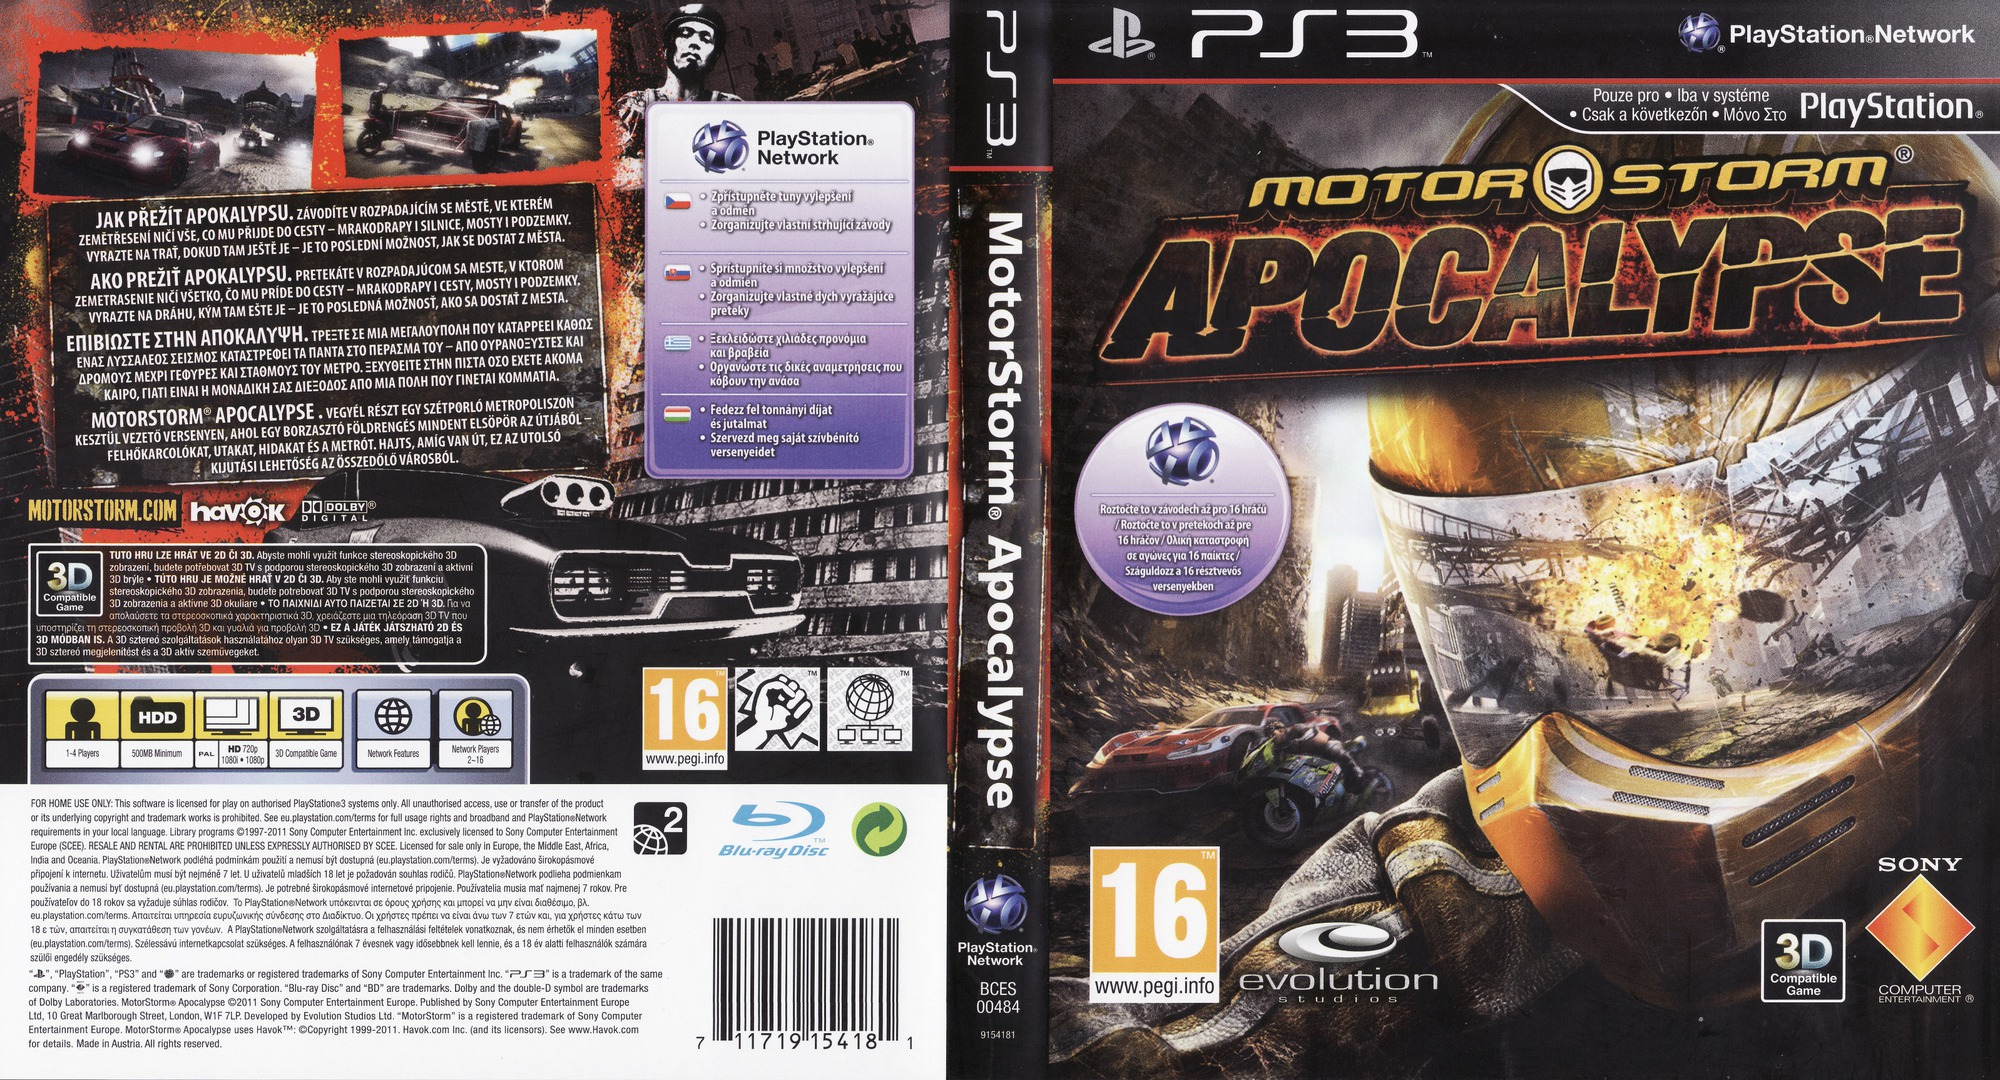 MotorStorm Apocalypse PS3 coverfullHQ (BCES00484)